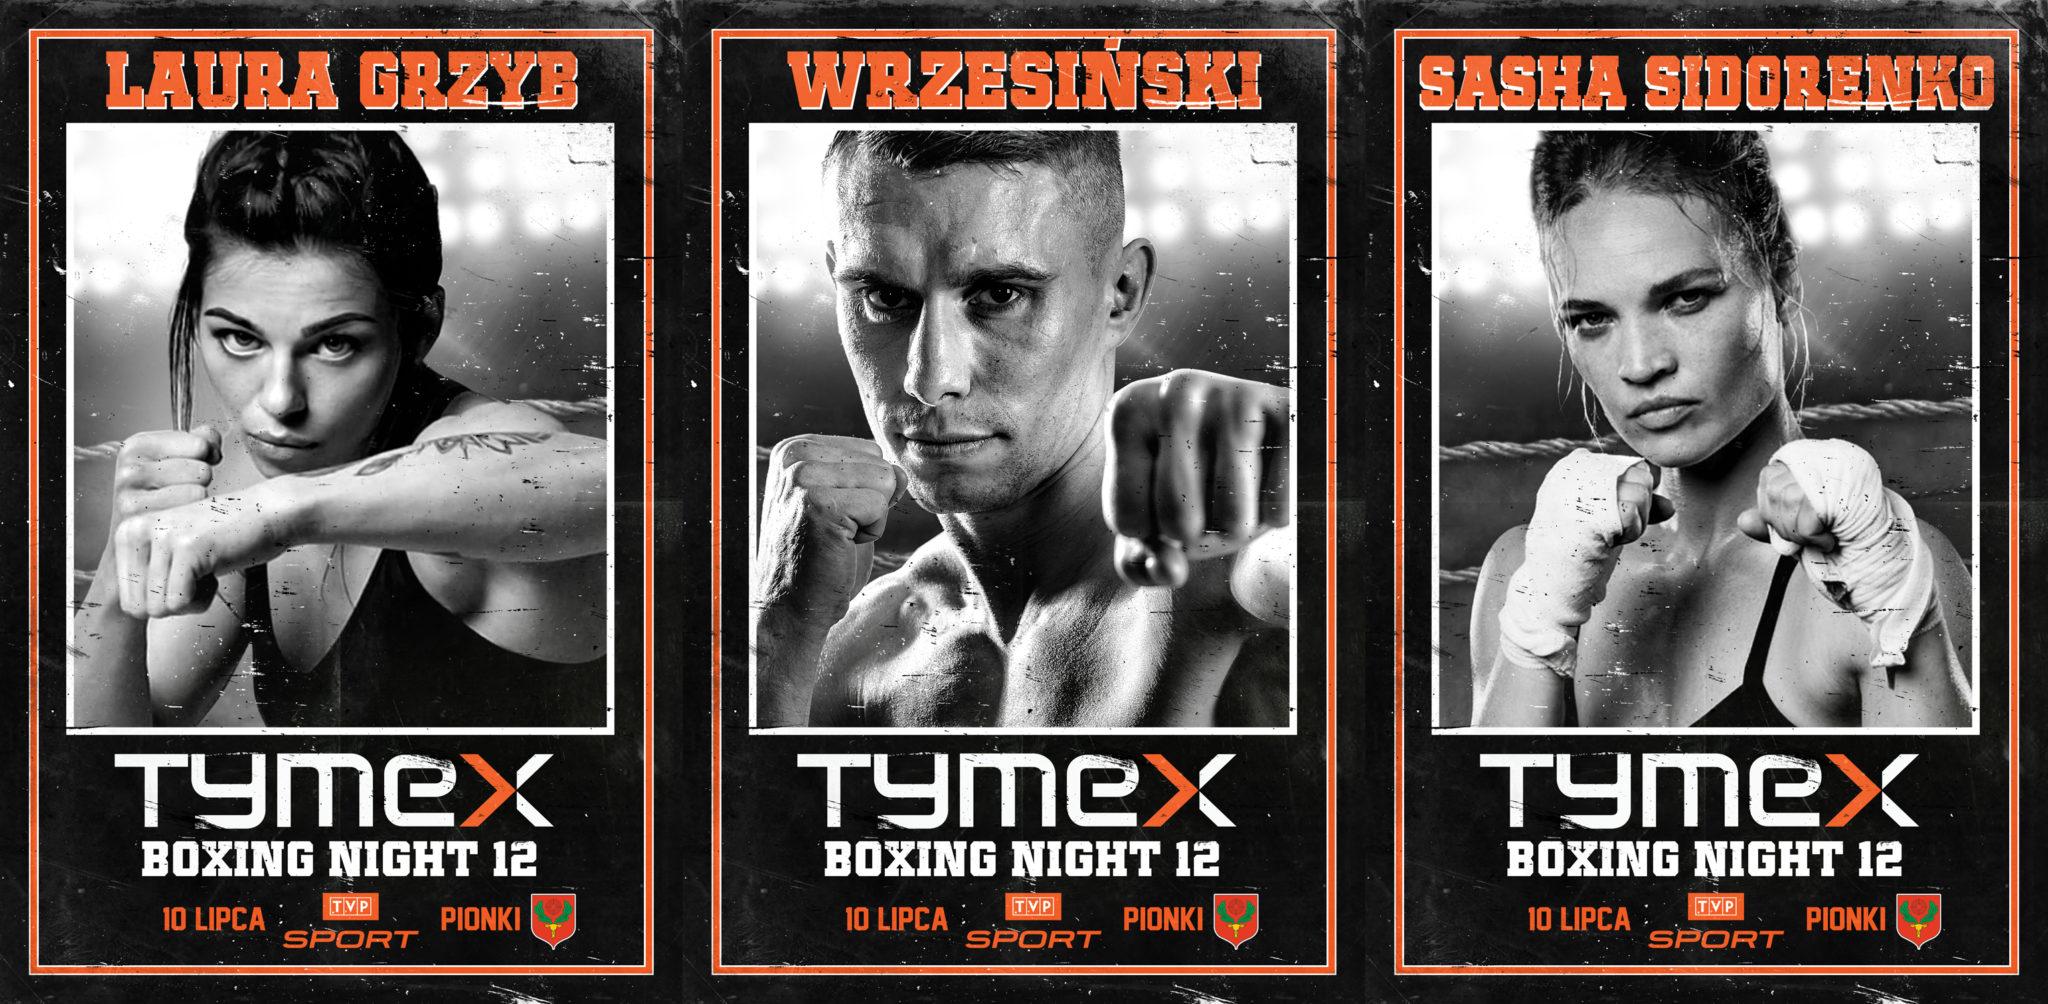 TYMEX Boxing Night 12 - TVP Sport - Pionki - 10 lipca